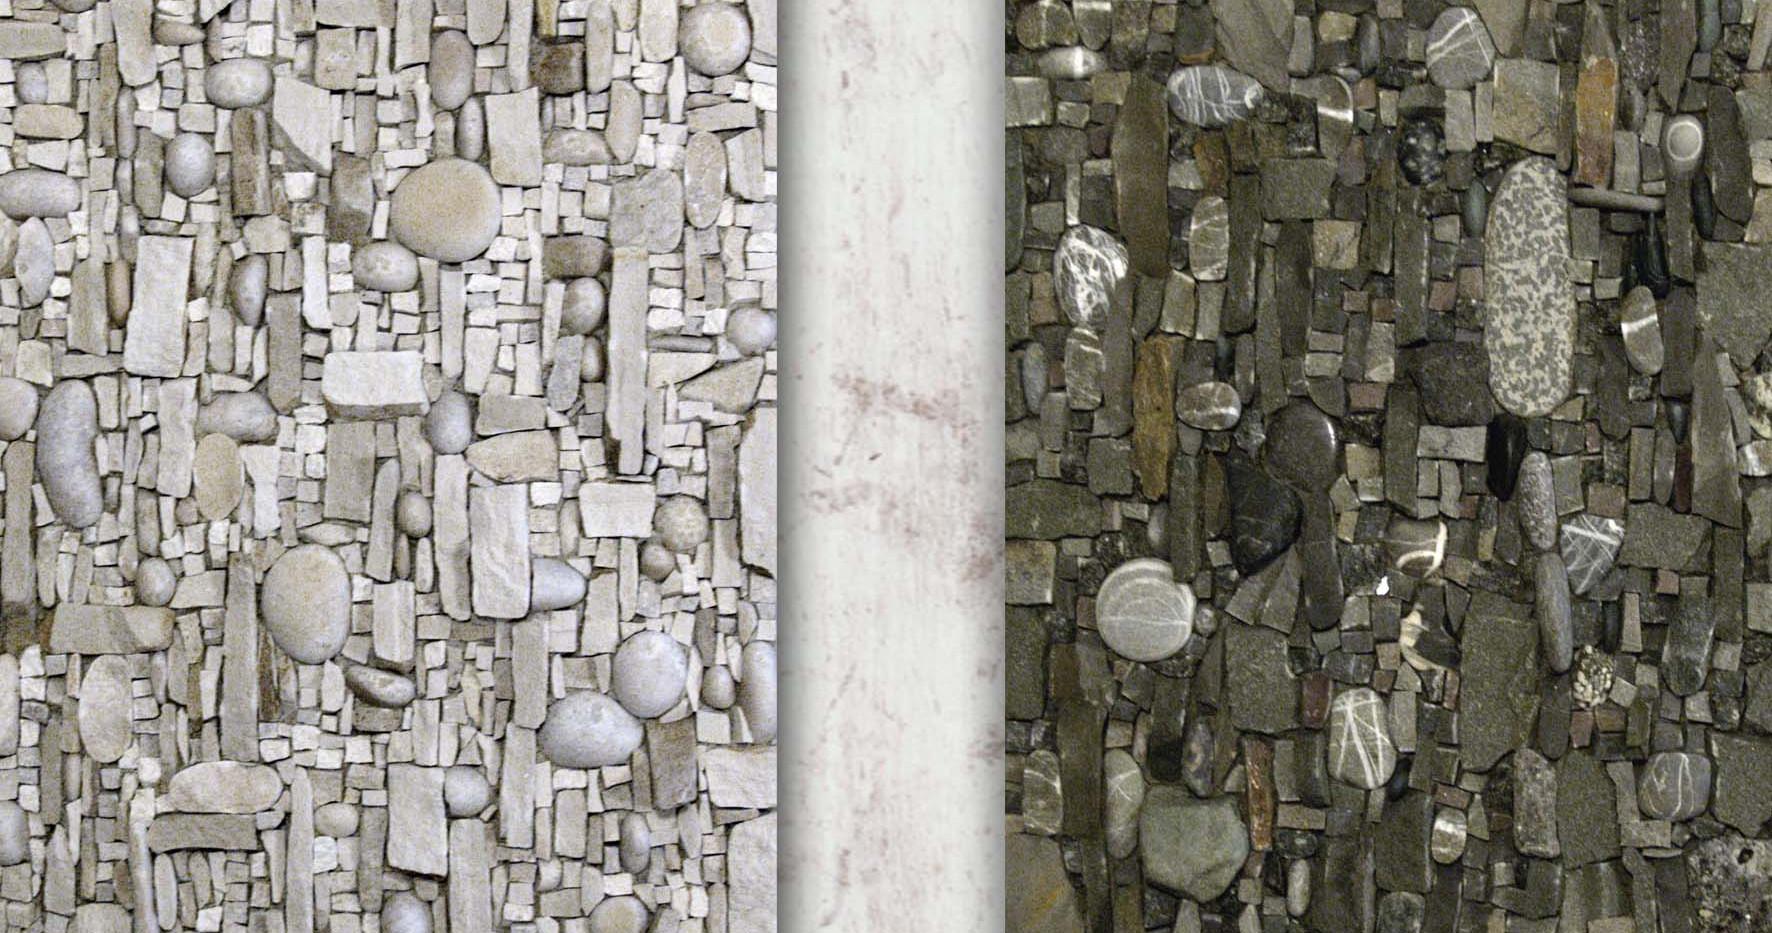 mosaico milano 10 marmo e pietre